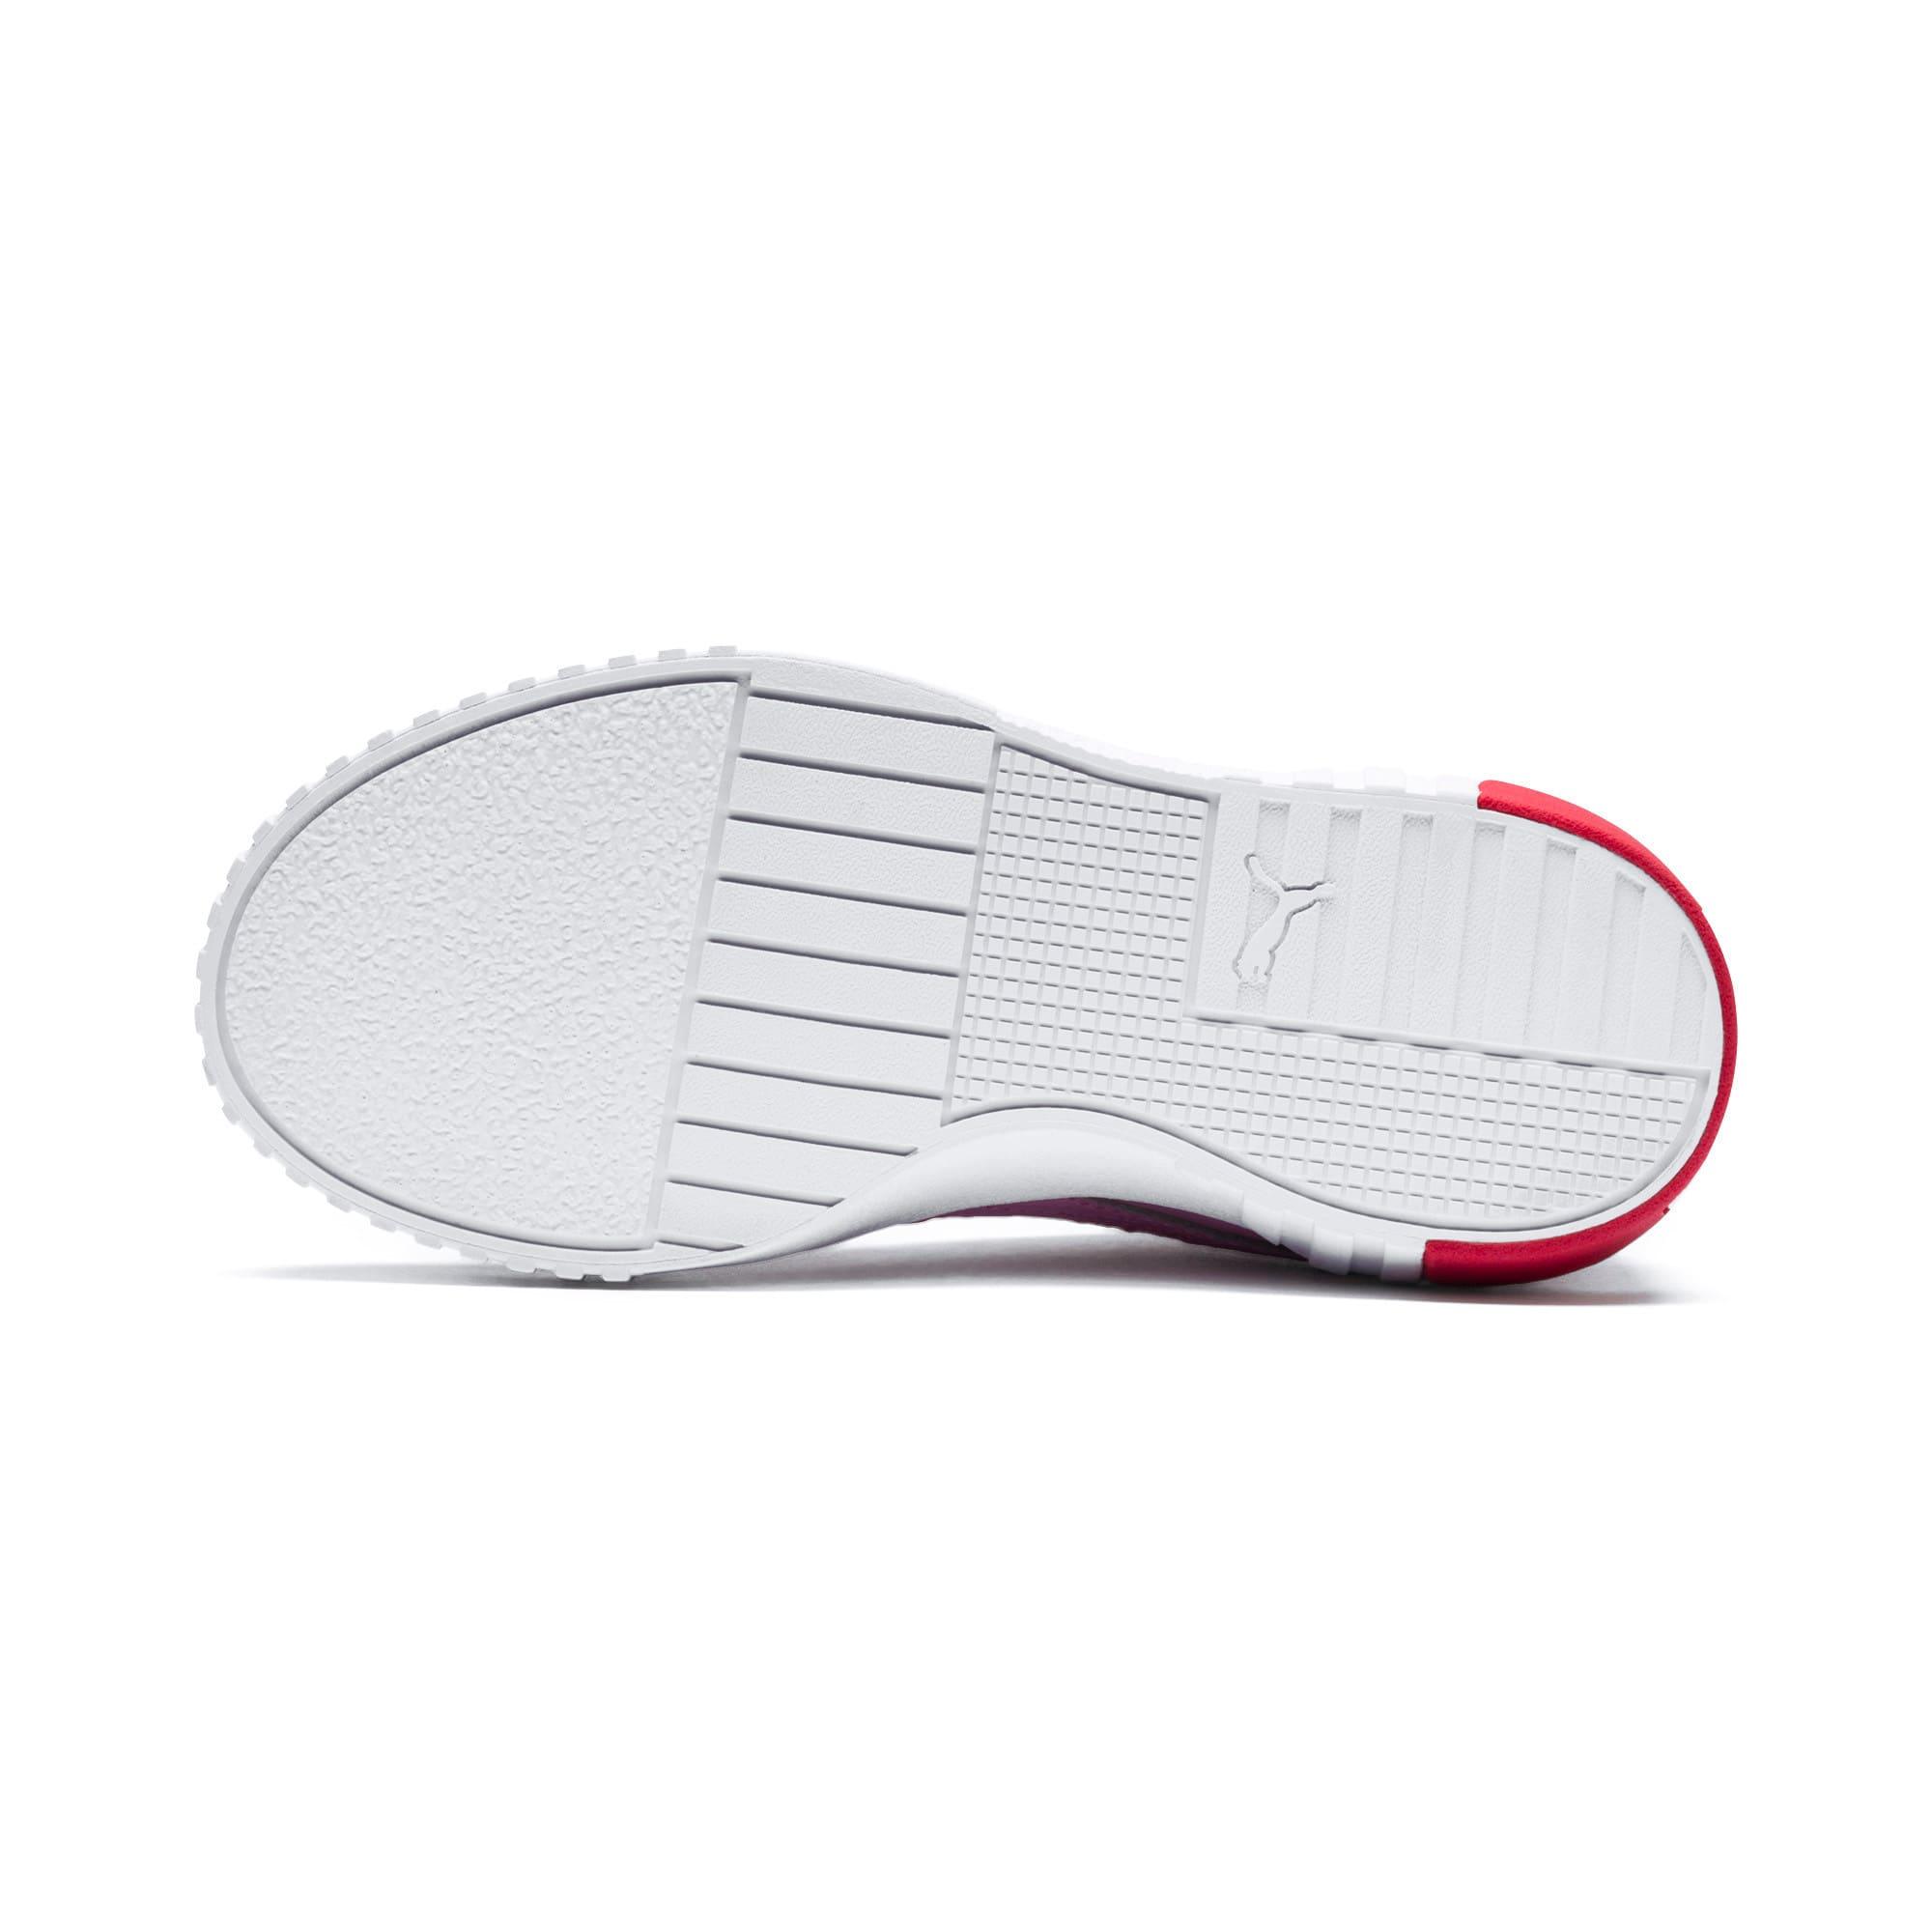 Thumbnail 4 of Cali sneakers voor meisjes, Puma White-Hibiscus, medium